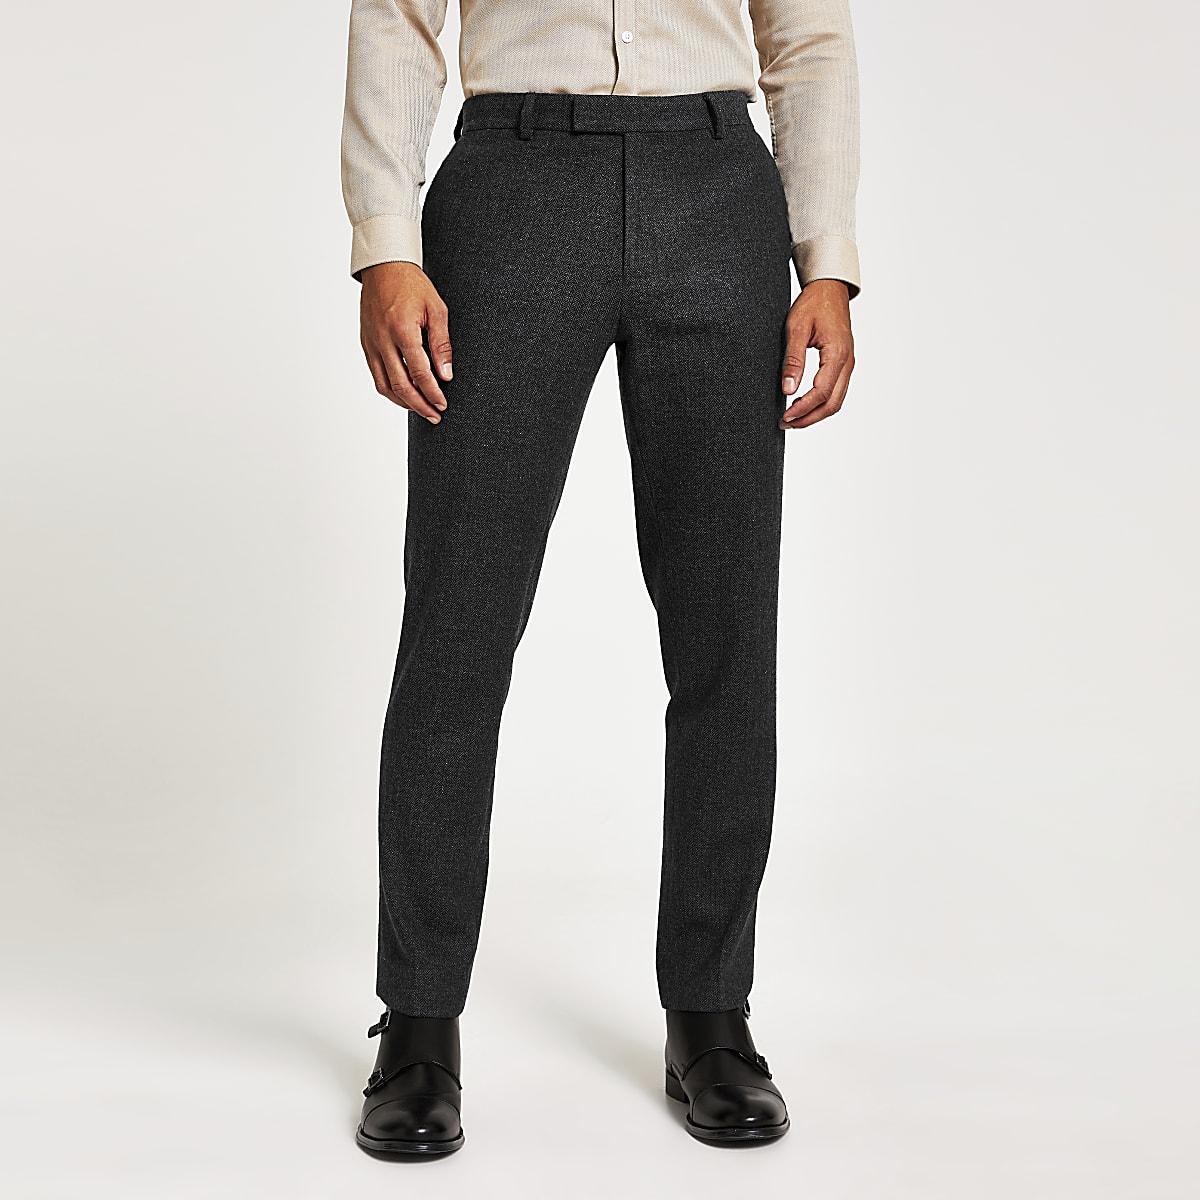 Marineblauwe skinny-fit pantalon